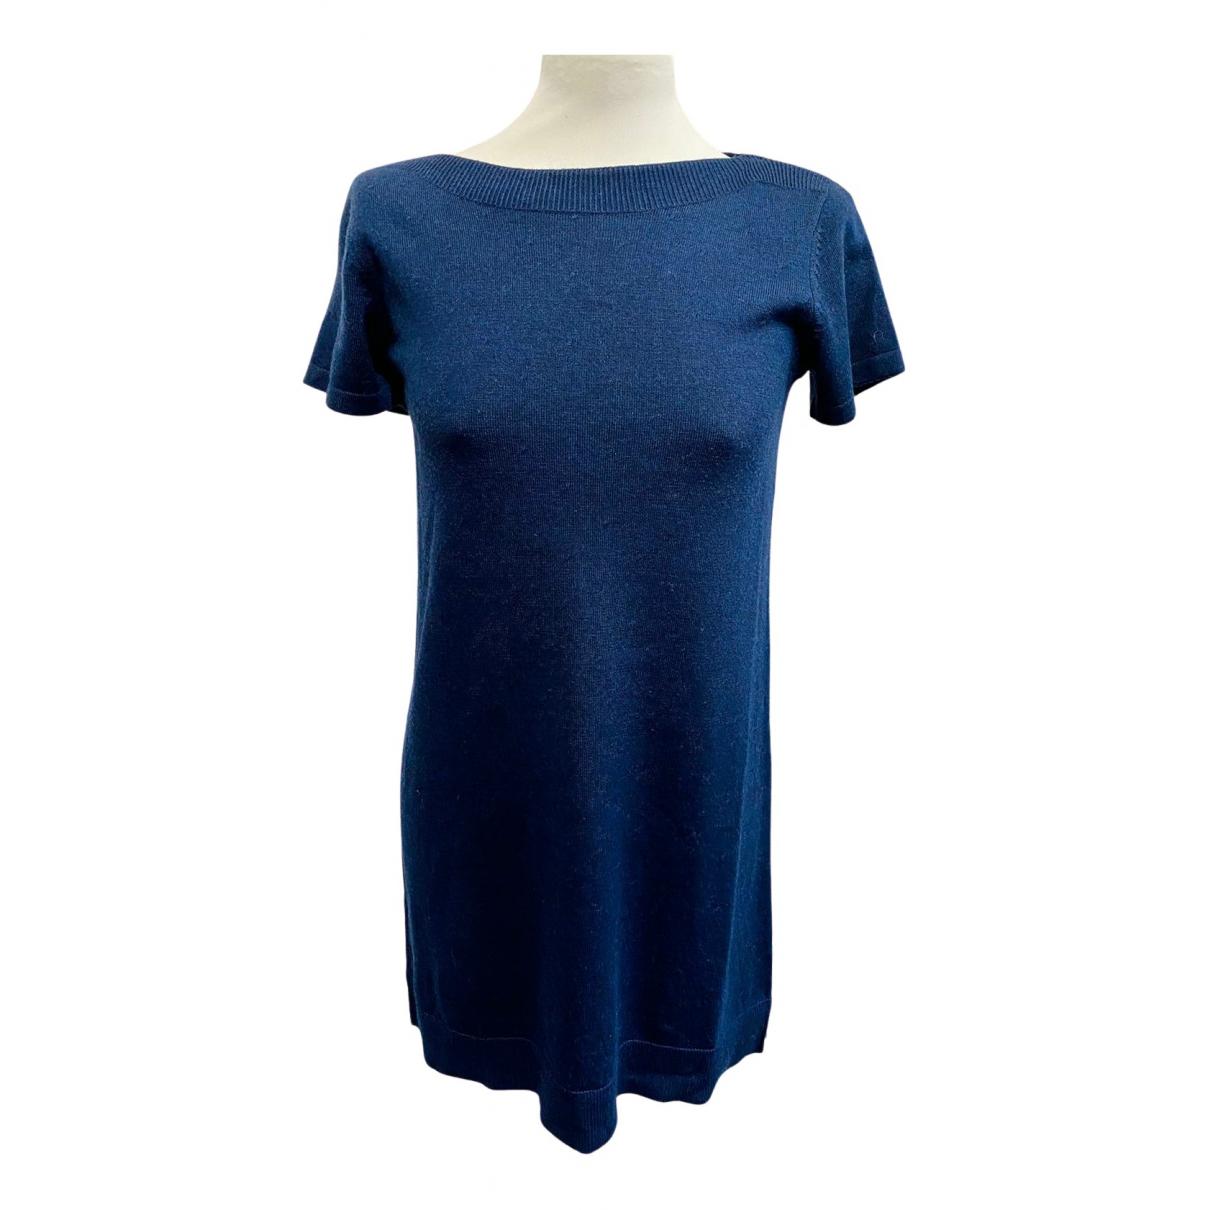 Apc N Blue Wool dress for Women XS International